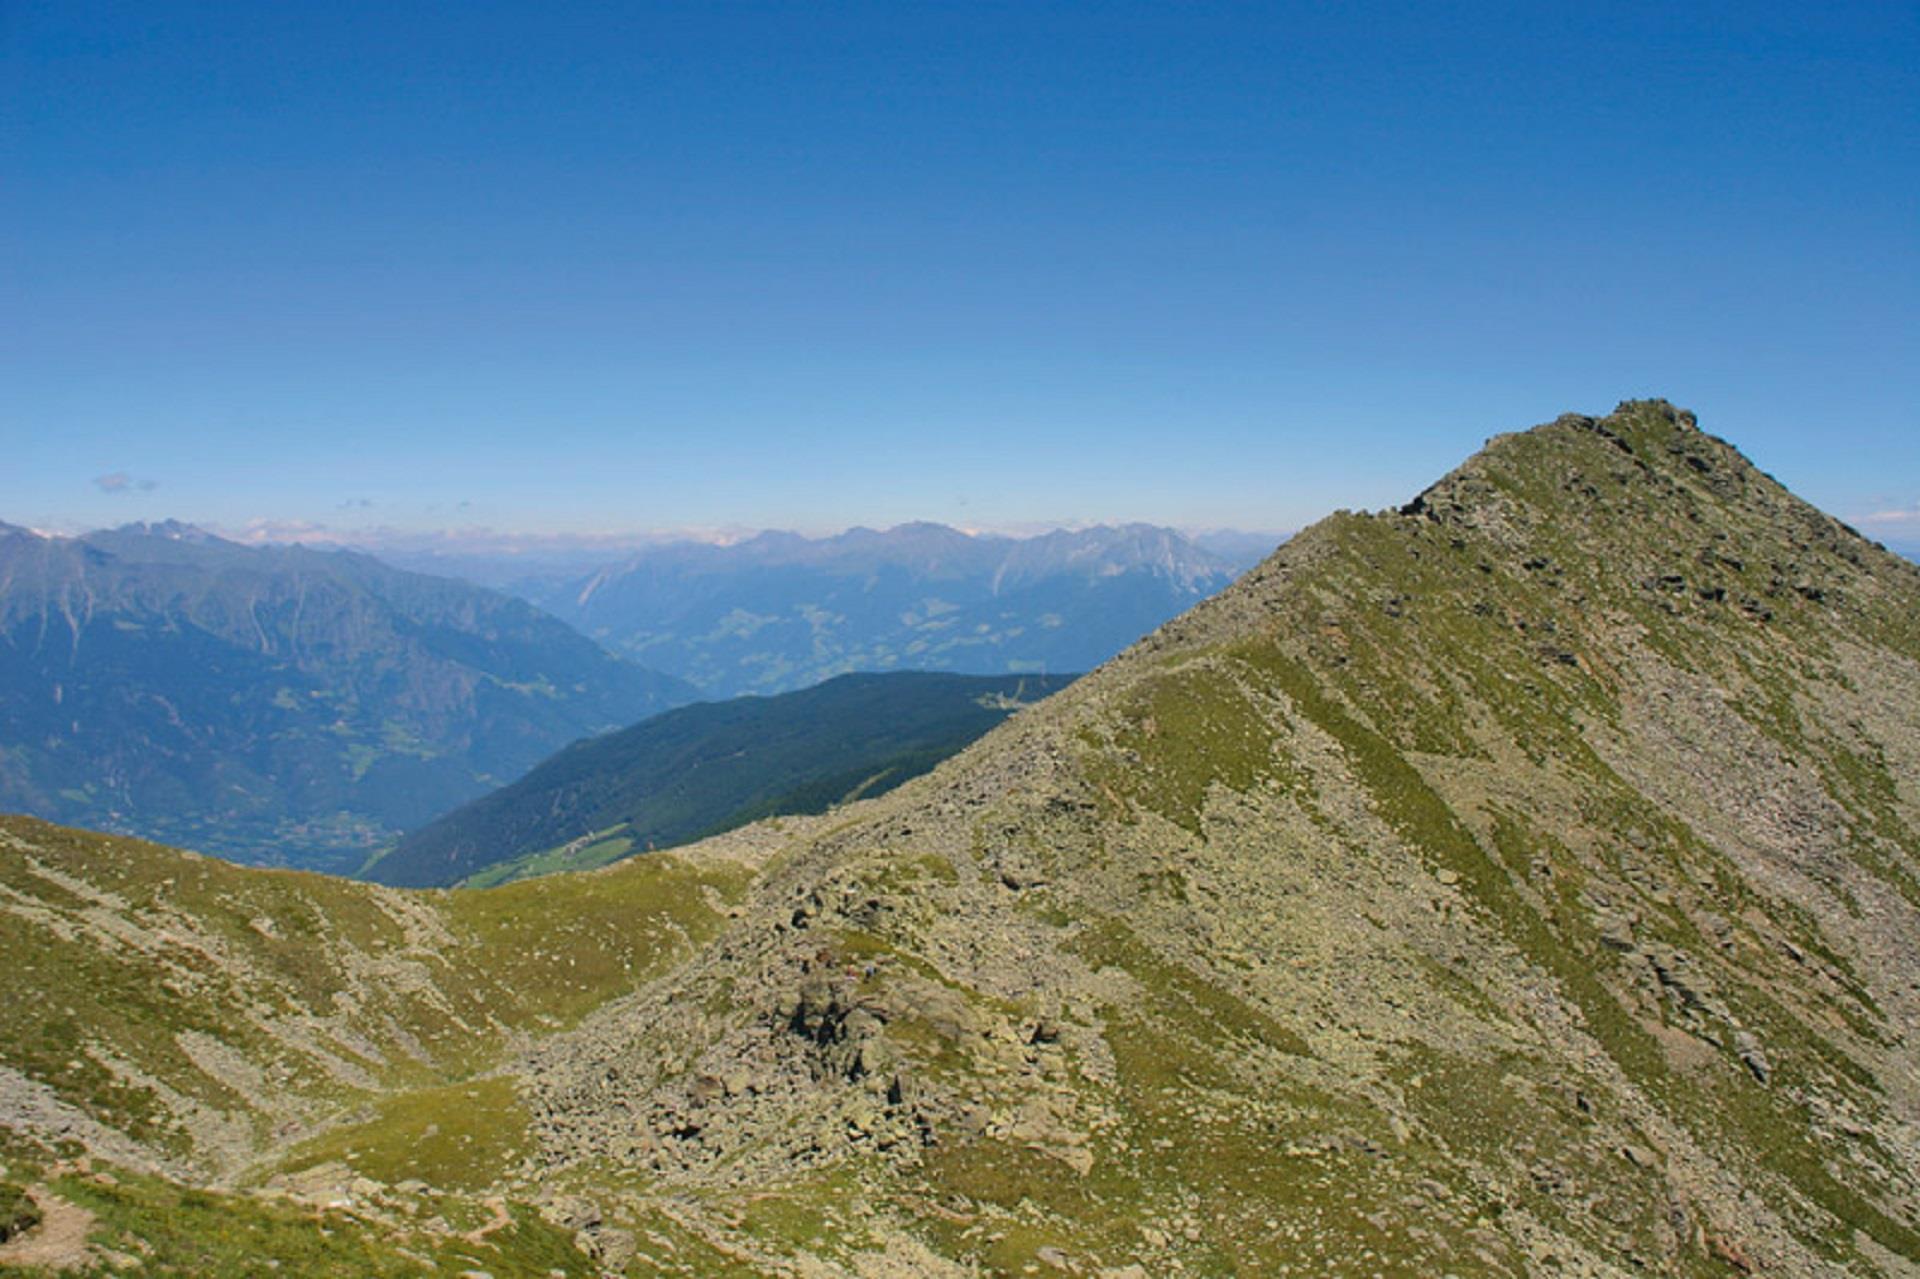 Aschbach - Naturnser Alm - Rauhjoch - Hochwart